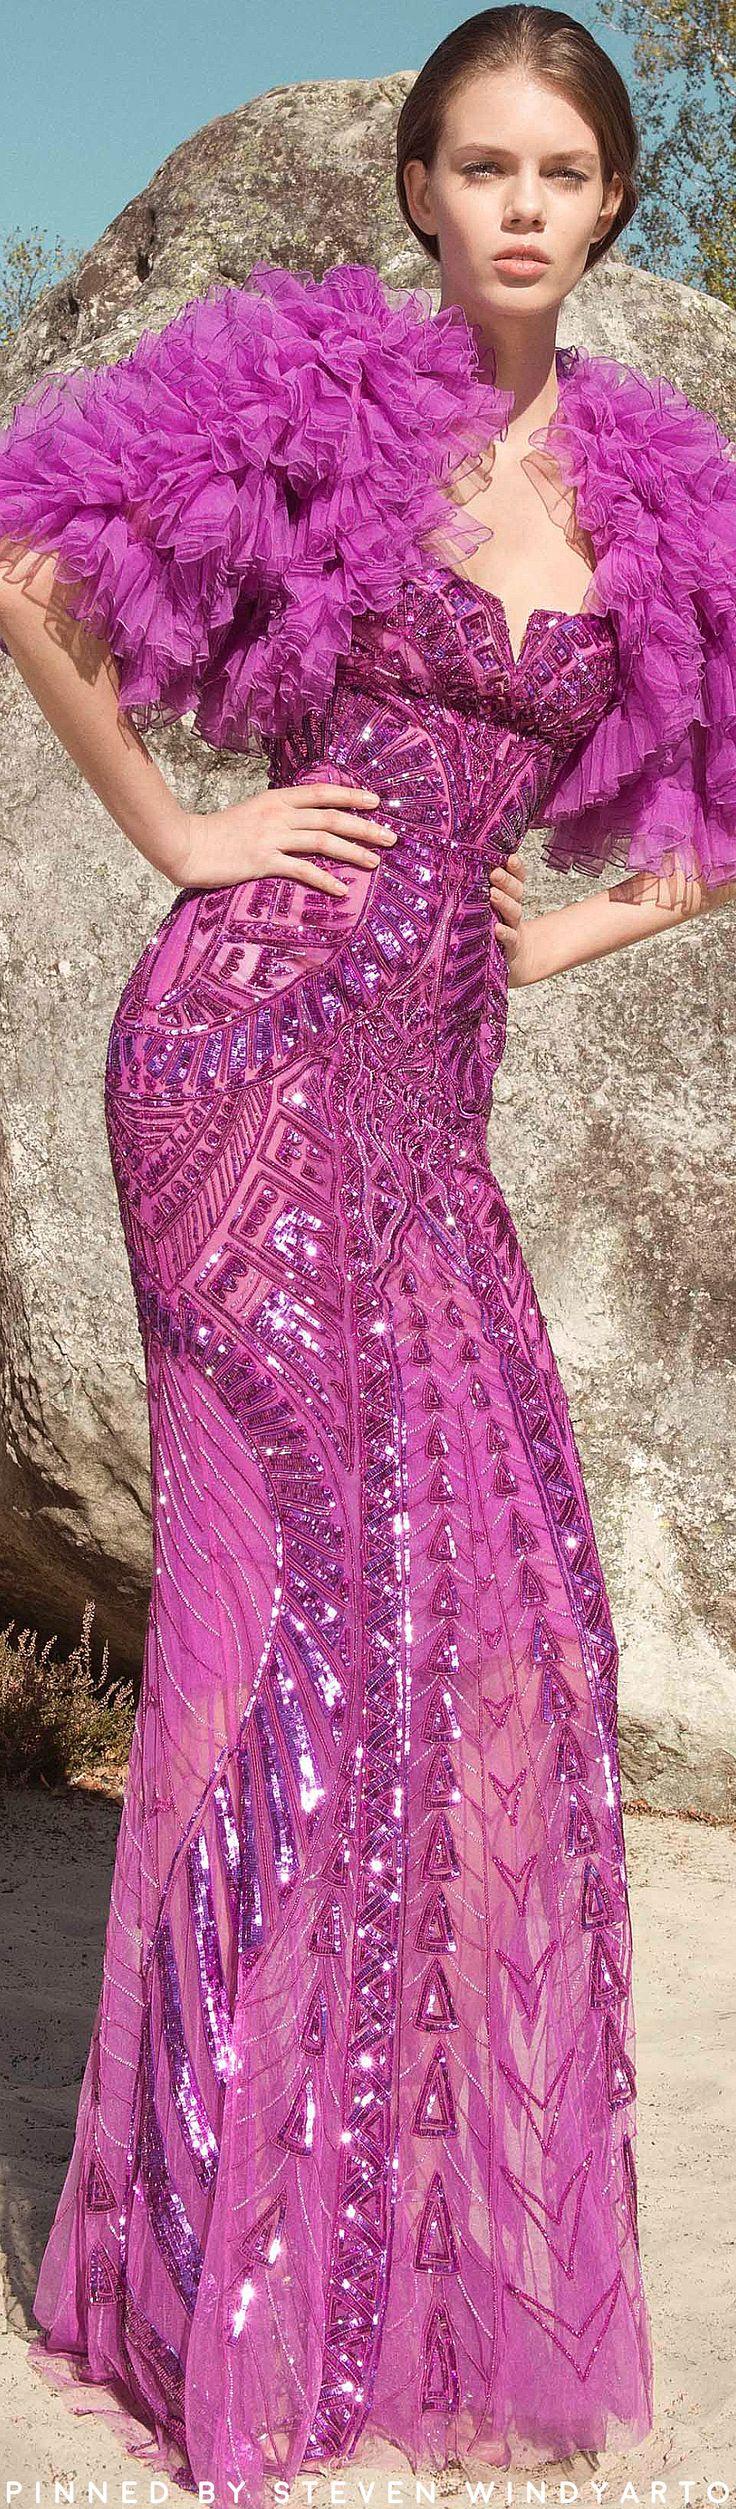 Zuhair Murad Spring 2019 Lookbook # spring2019 # ss19 #womenswear #zuhairmurad   – Women's Fashion